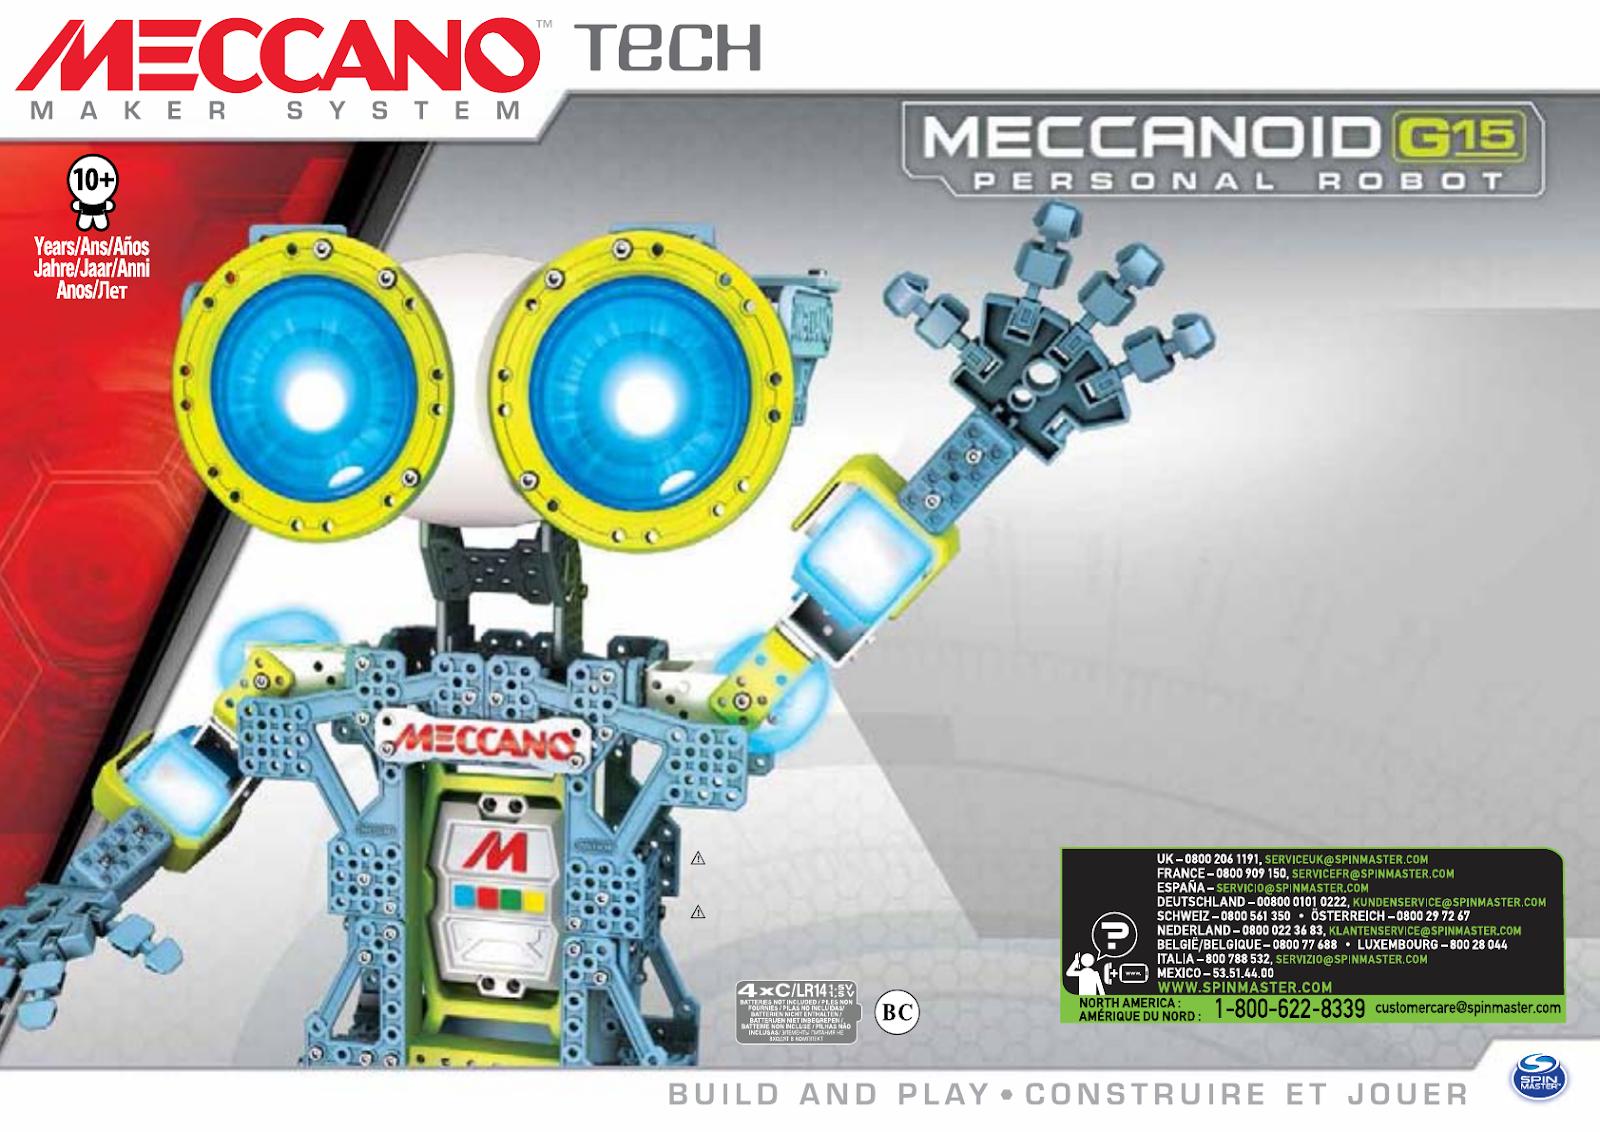 Robot kits: Meccano-Erector Meccanoid G15